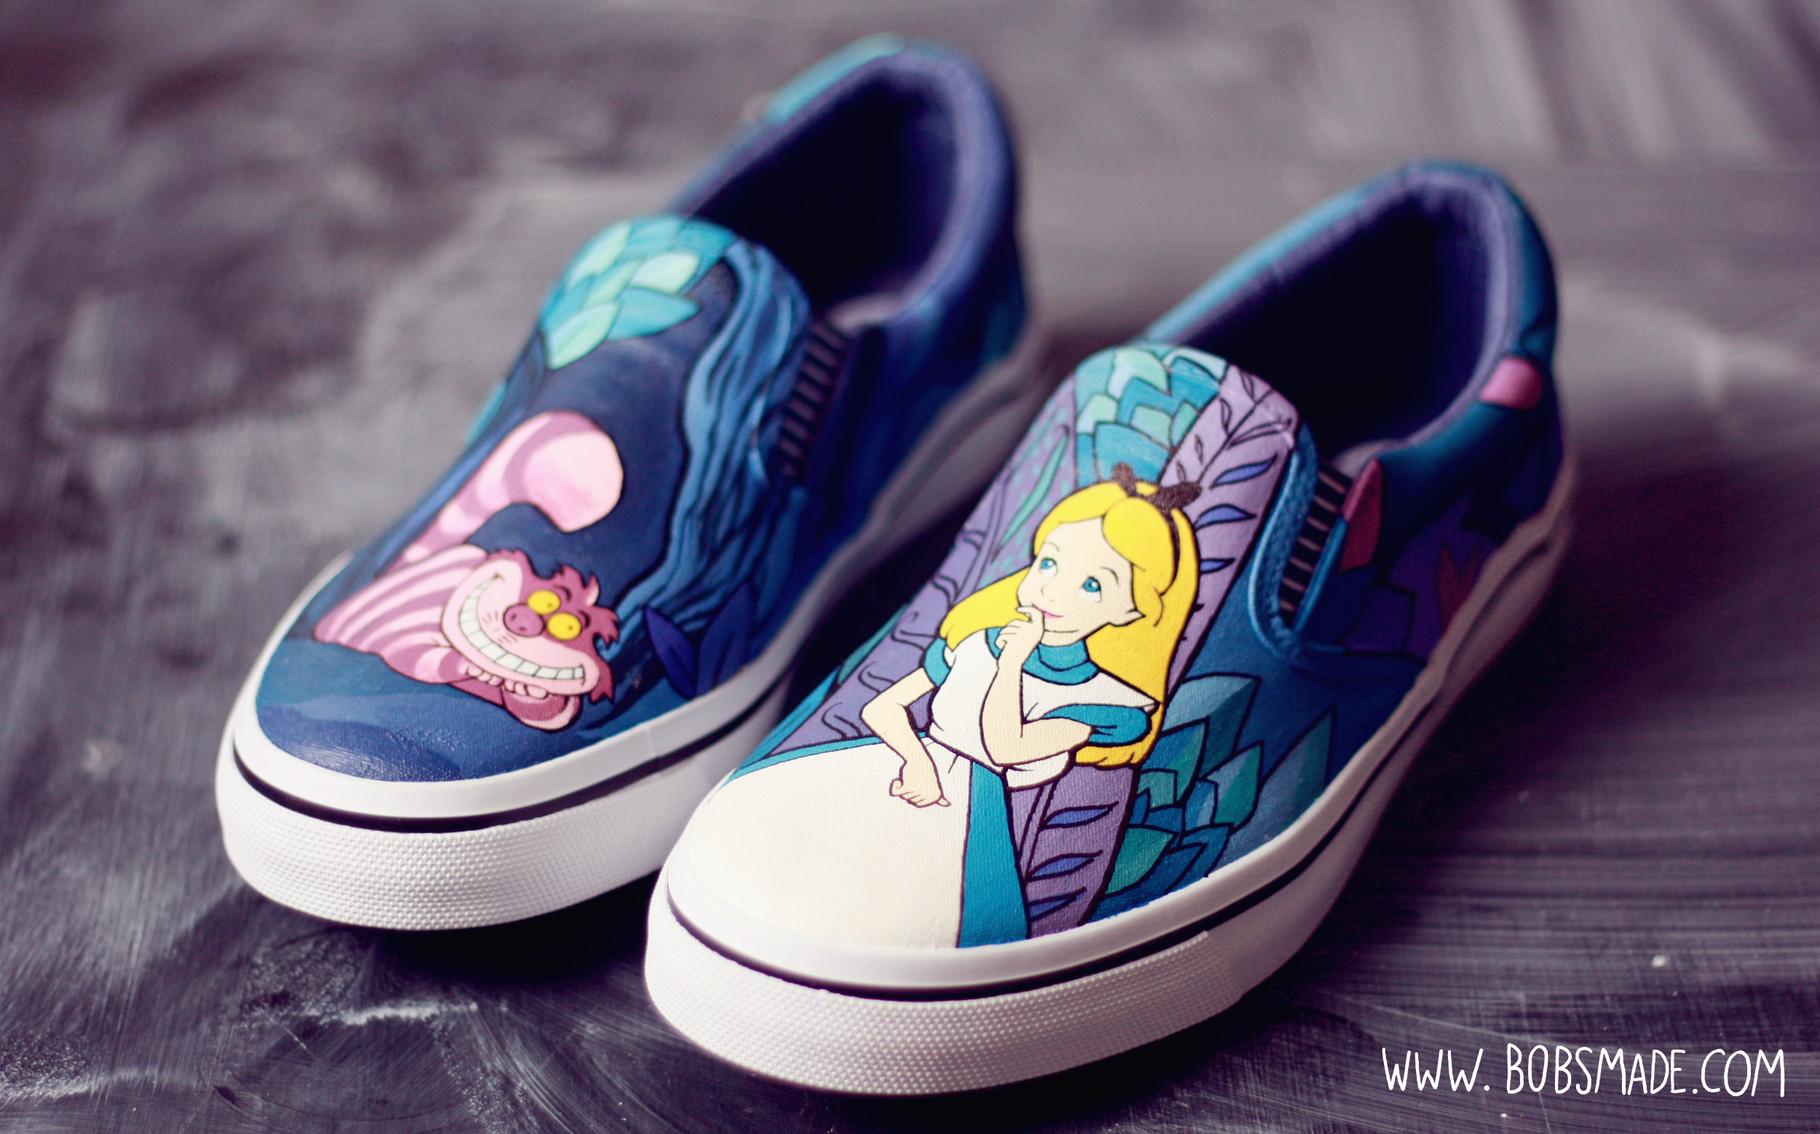 Alice in Wonderland Shoes - Art